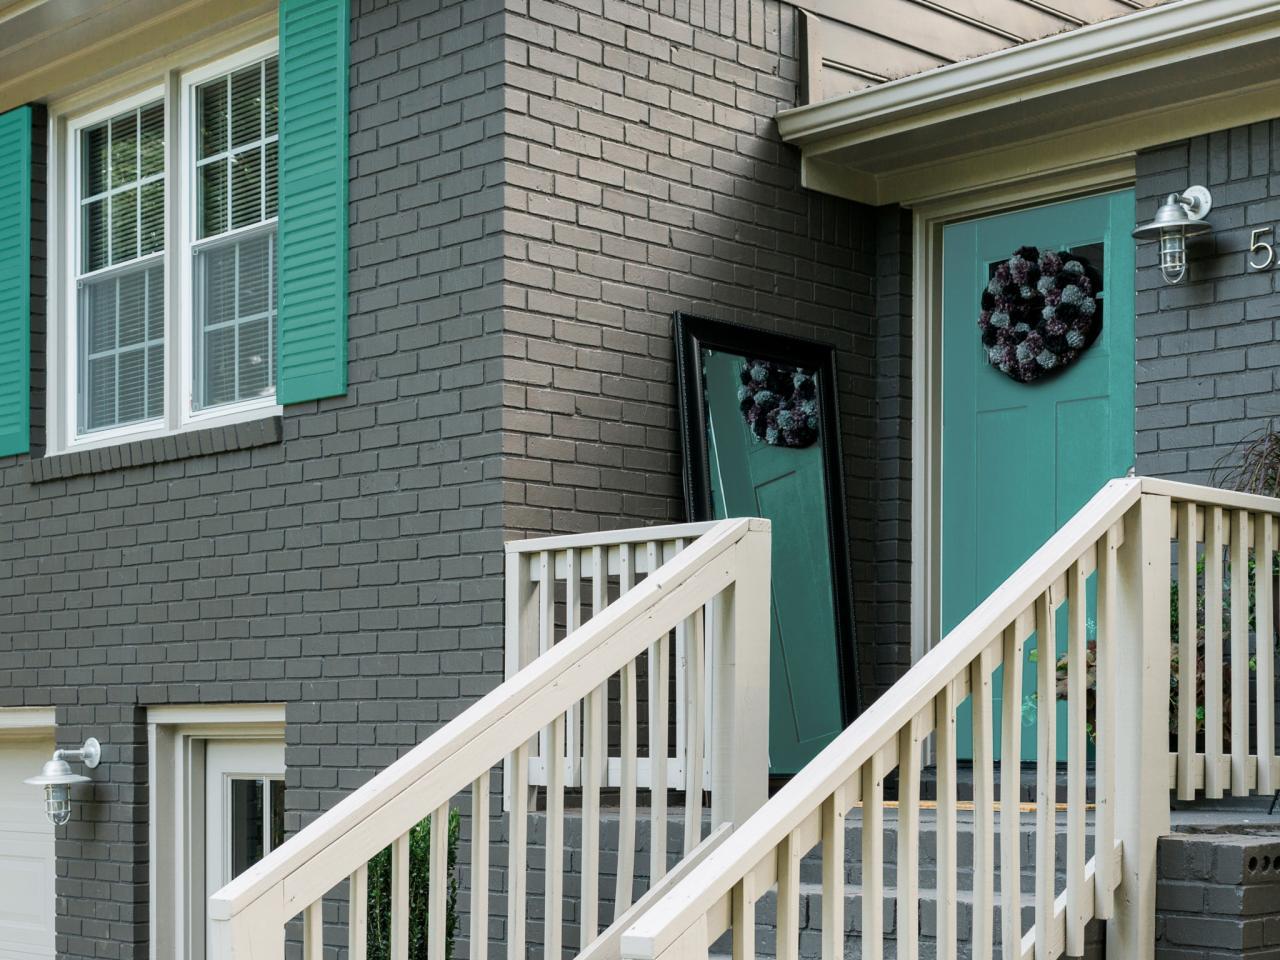 Fall curb appeal ideas hgtv 39 s decorating design blog hgtv - Eggshell exterior paint ideas ...